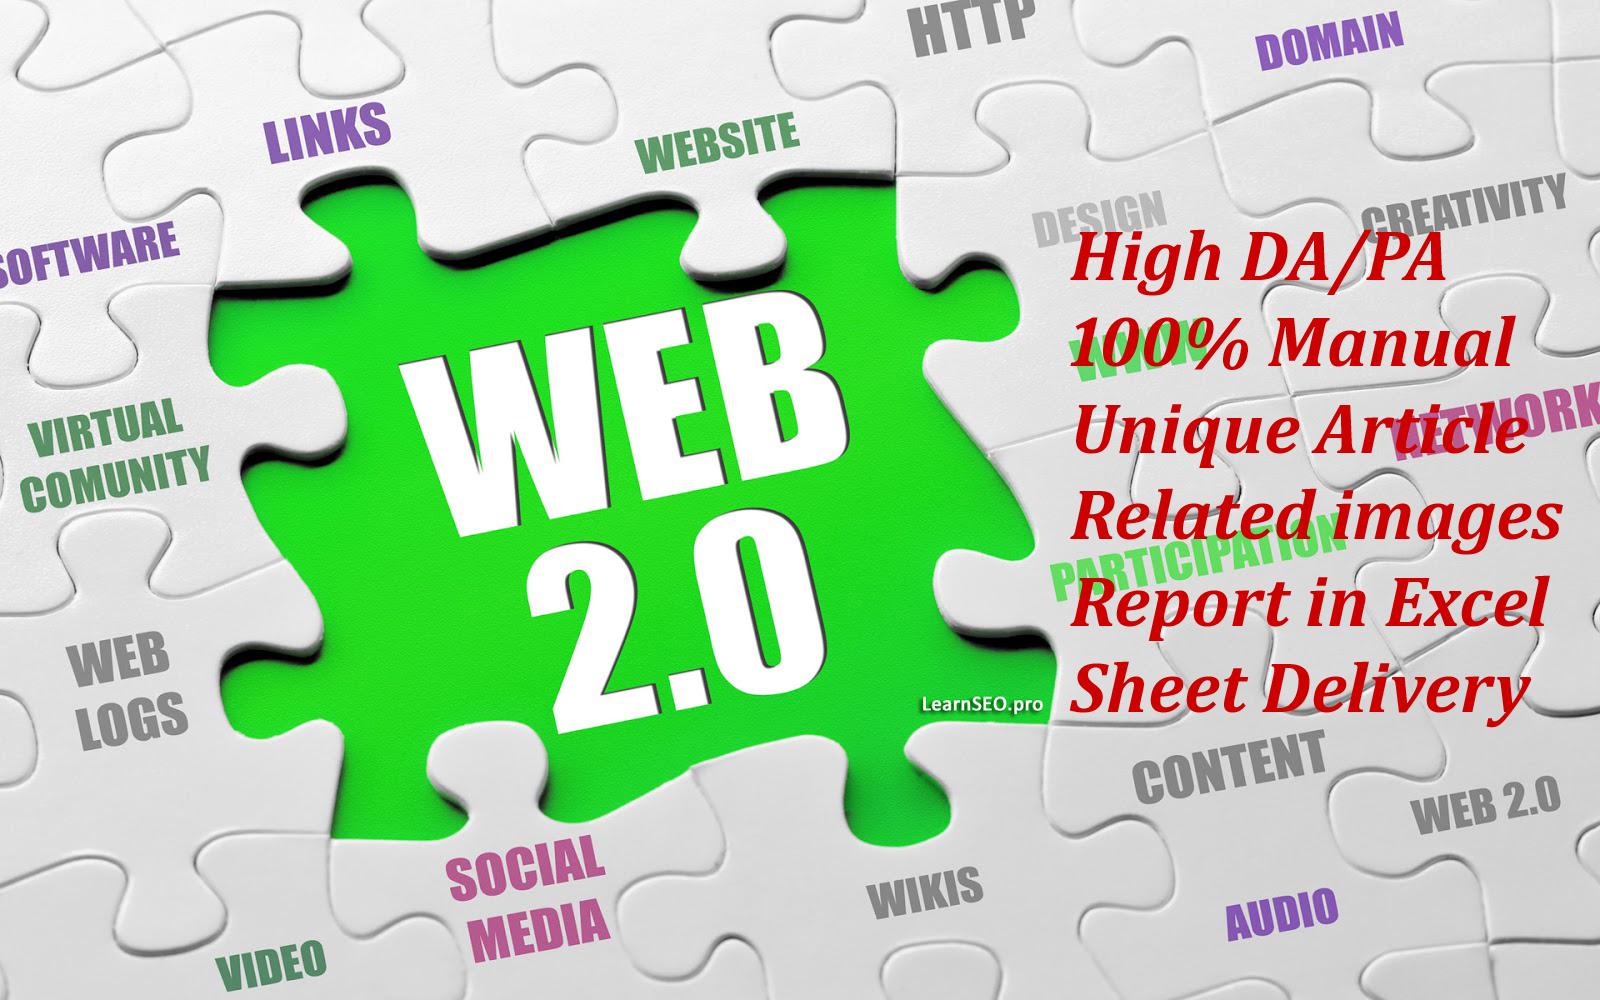 High Domain Authority 20 Web 2.0 back-links